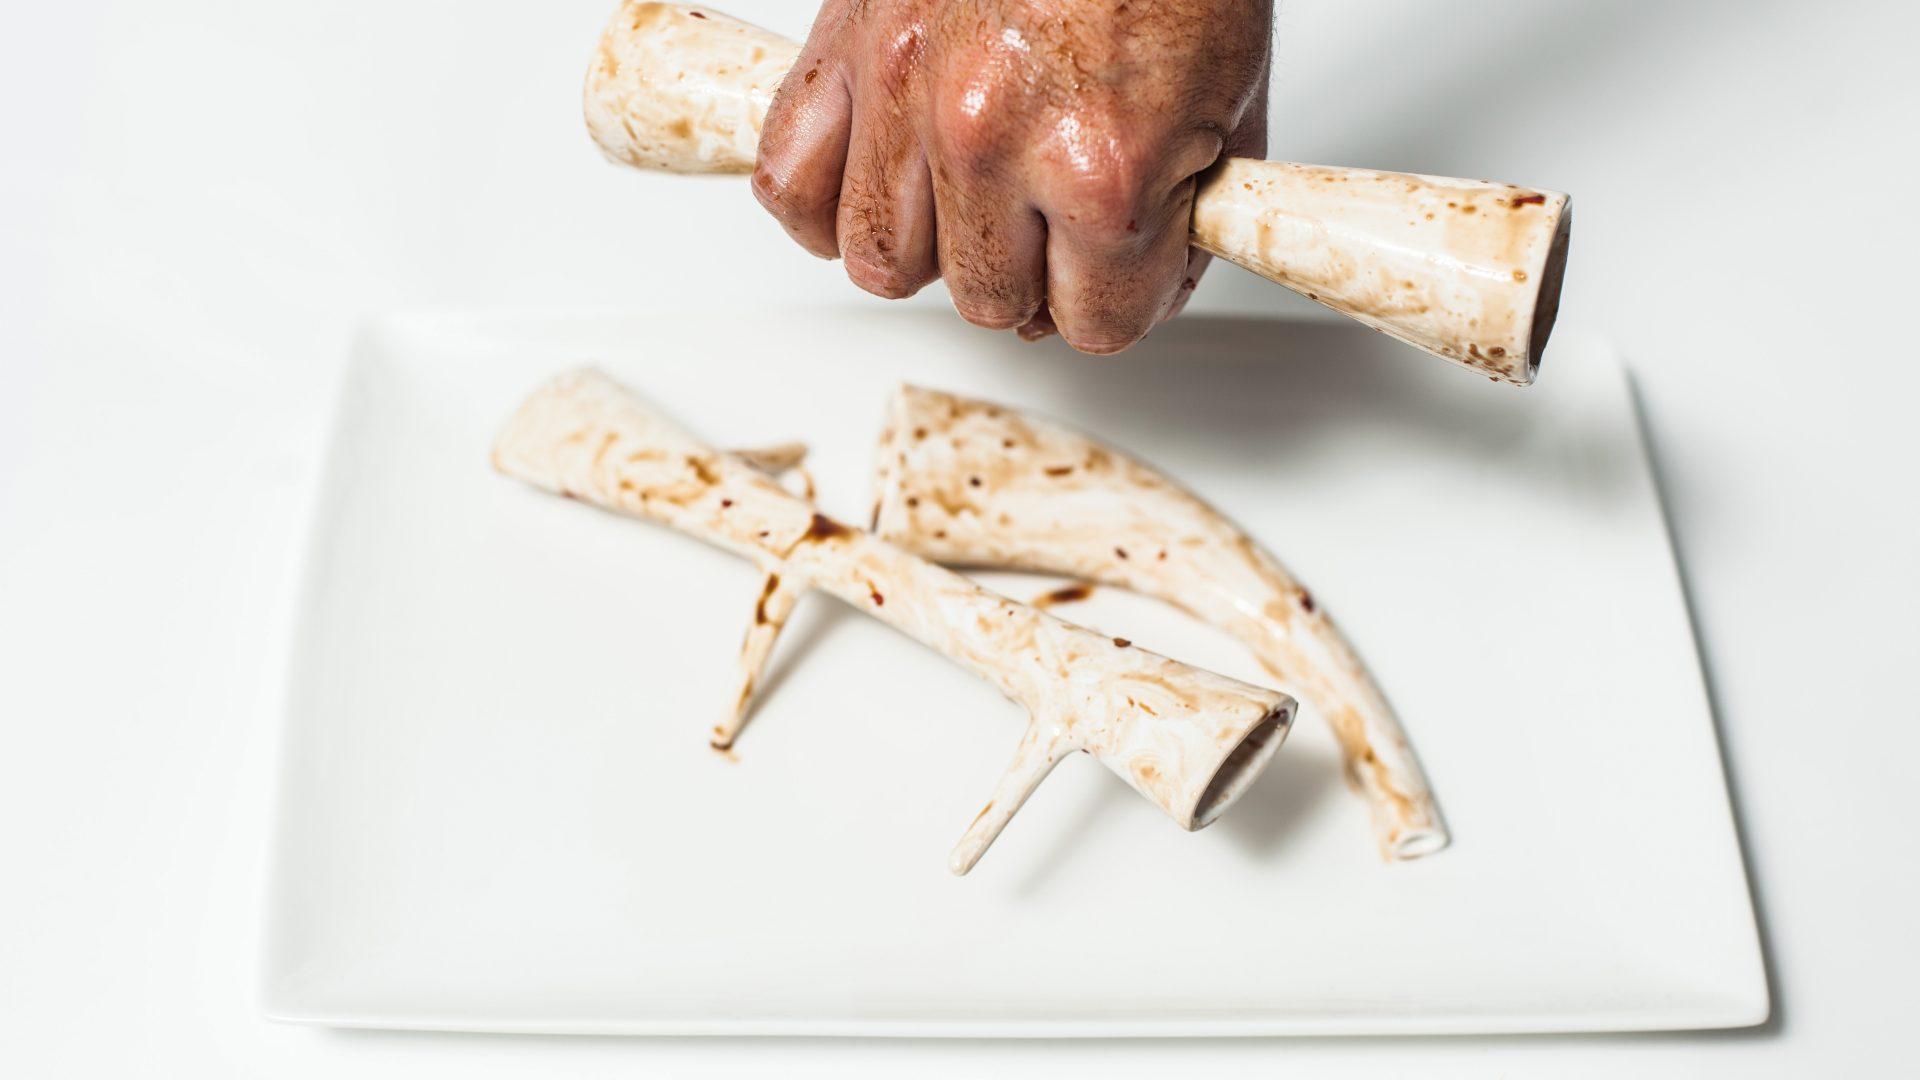 Next Nature: Bone Pickers, 2014. Bone Pickers, made of cultured meat around an ersatz bone scaffold.